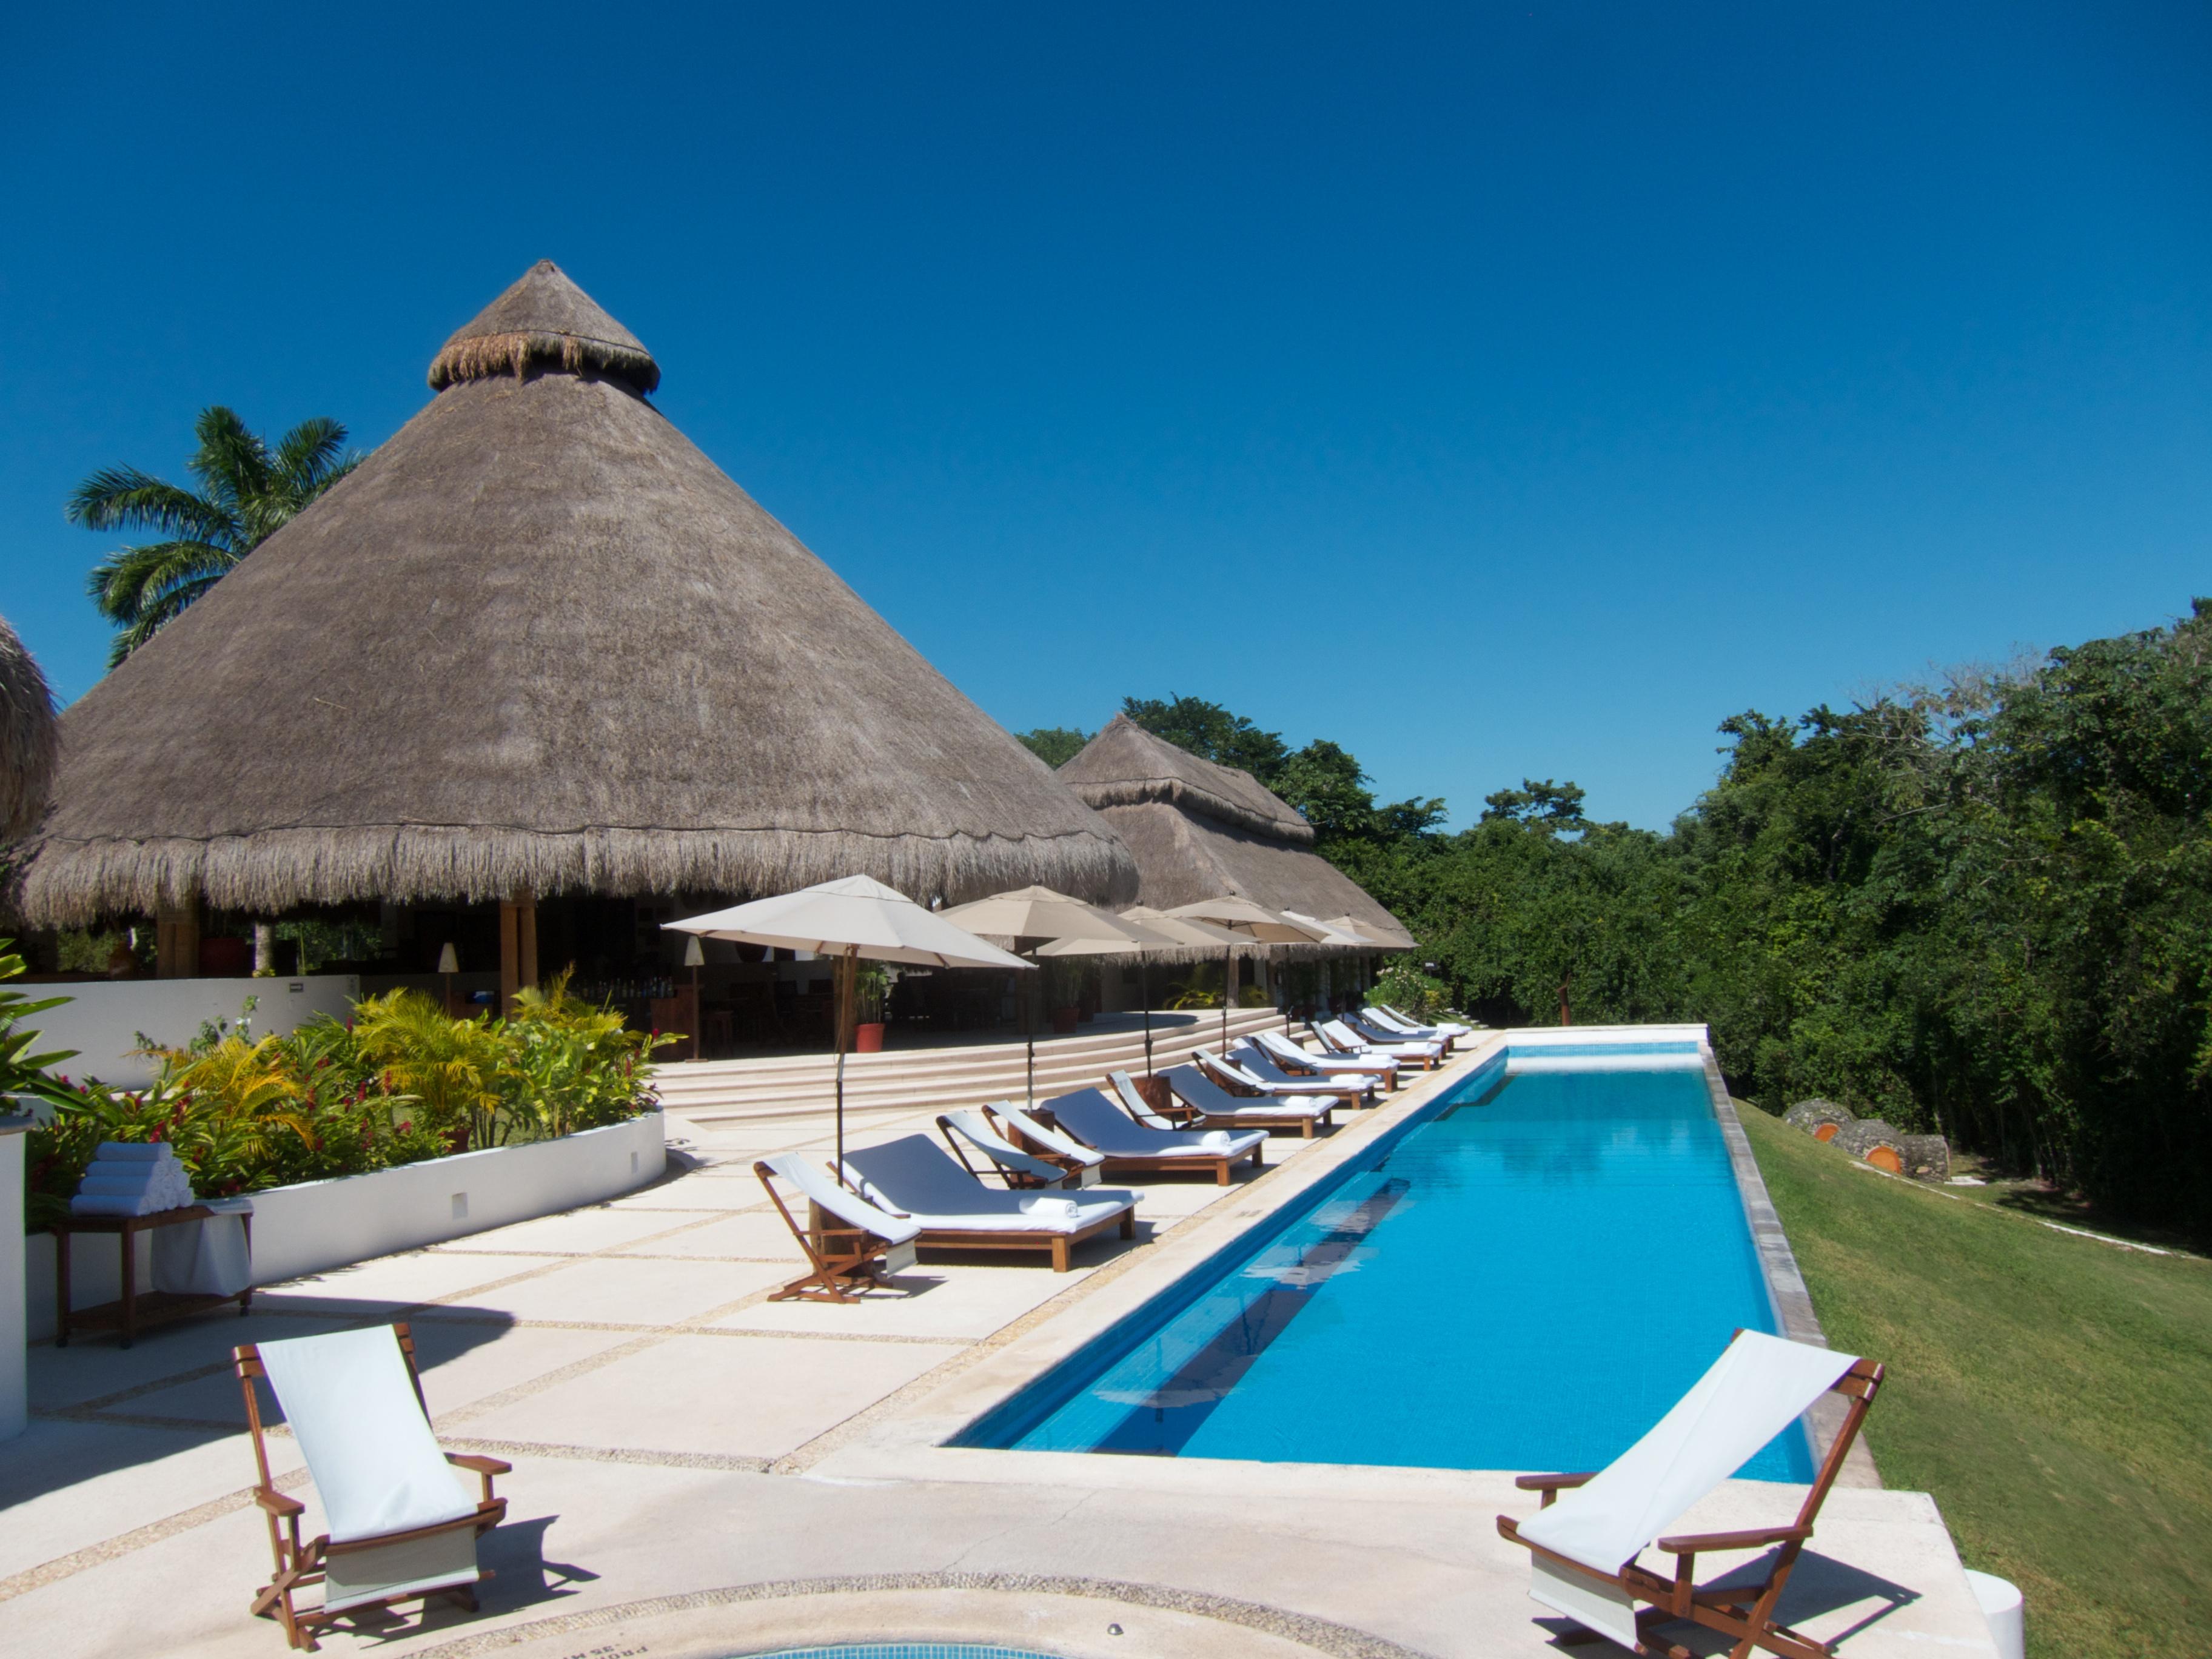 Hotel explorean kohunlich top travel spot for Americana hotel nyc